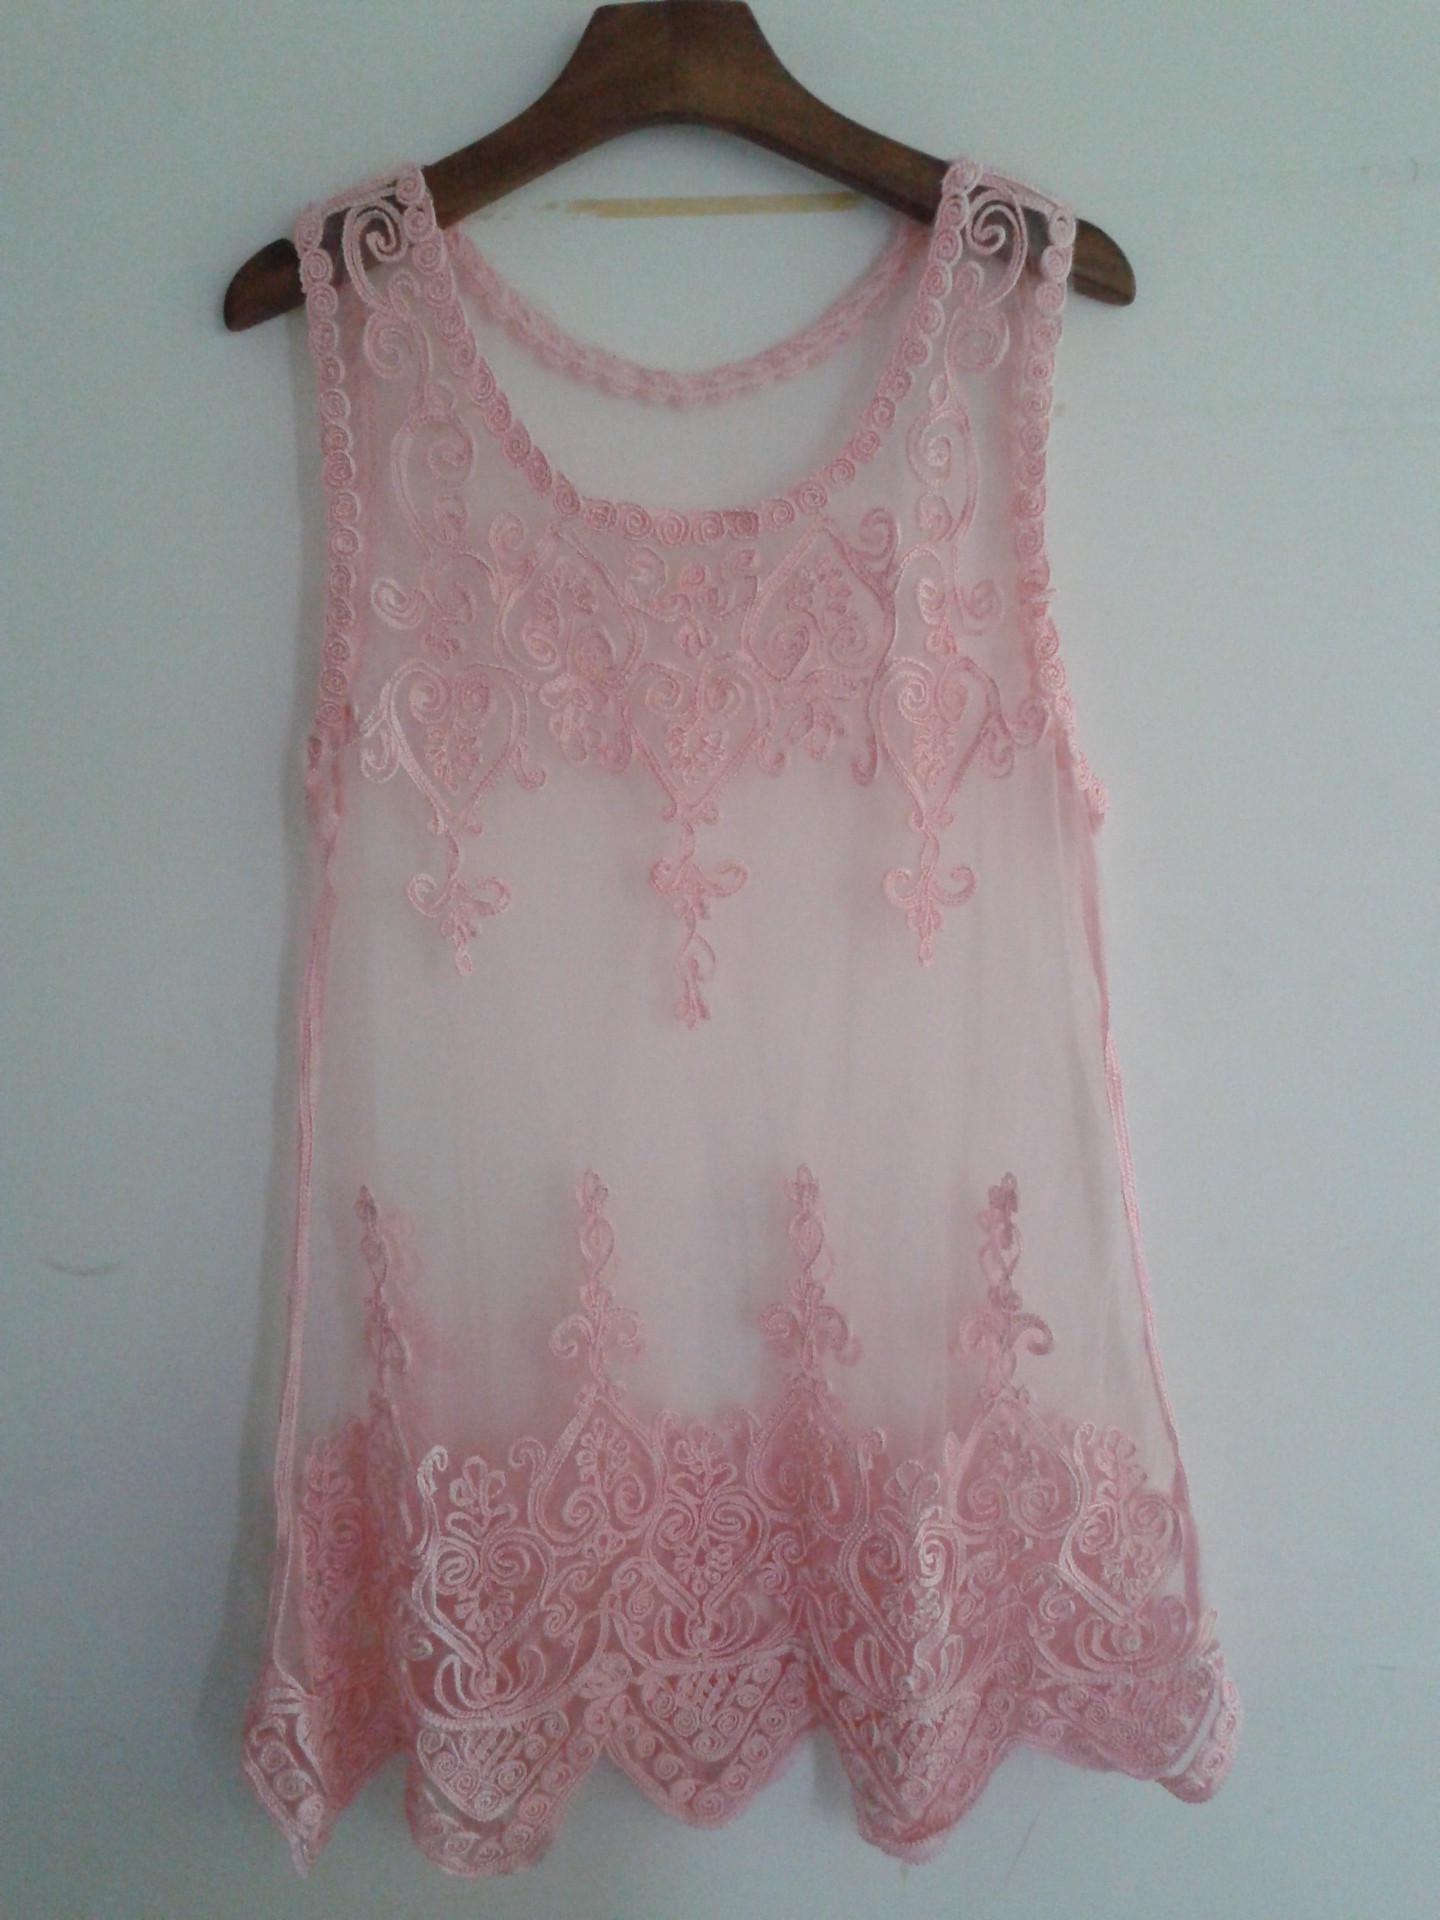 Purple camo wedding dresses  jakey young sherlock on Pinterest